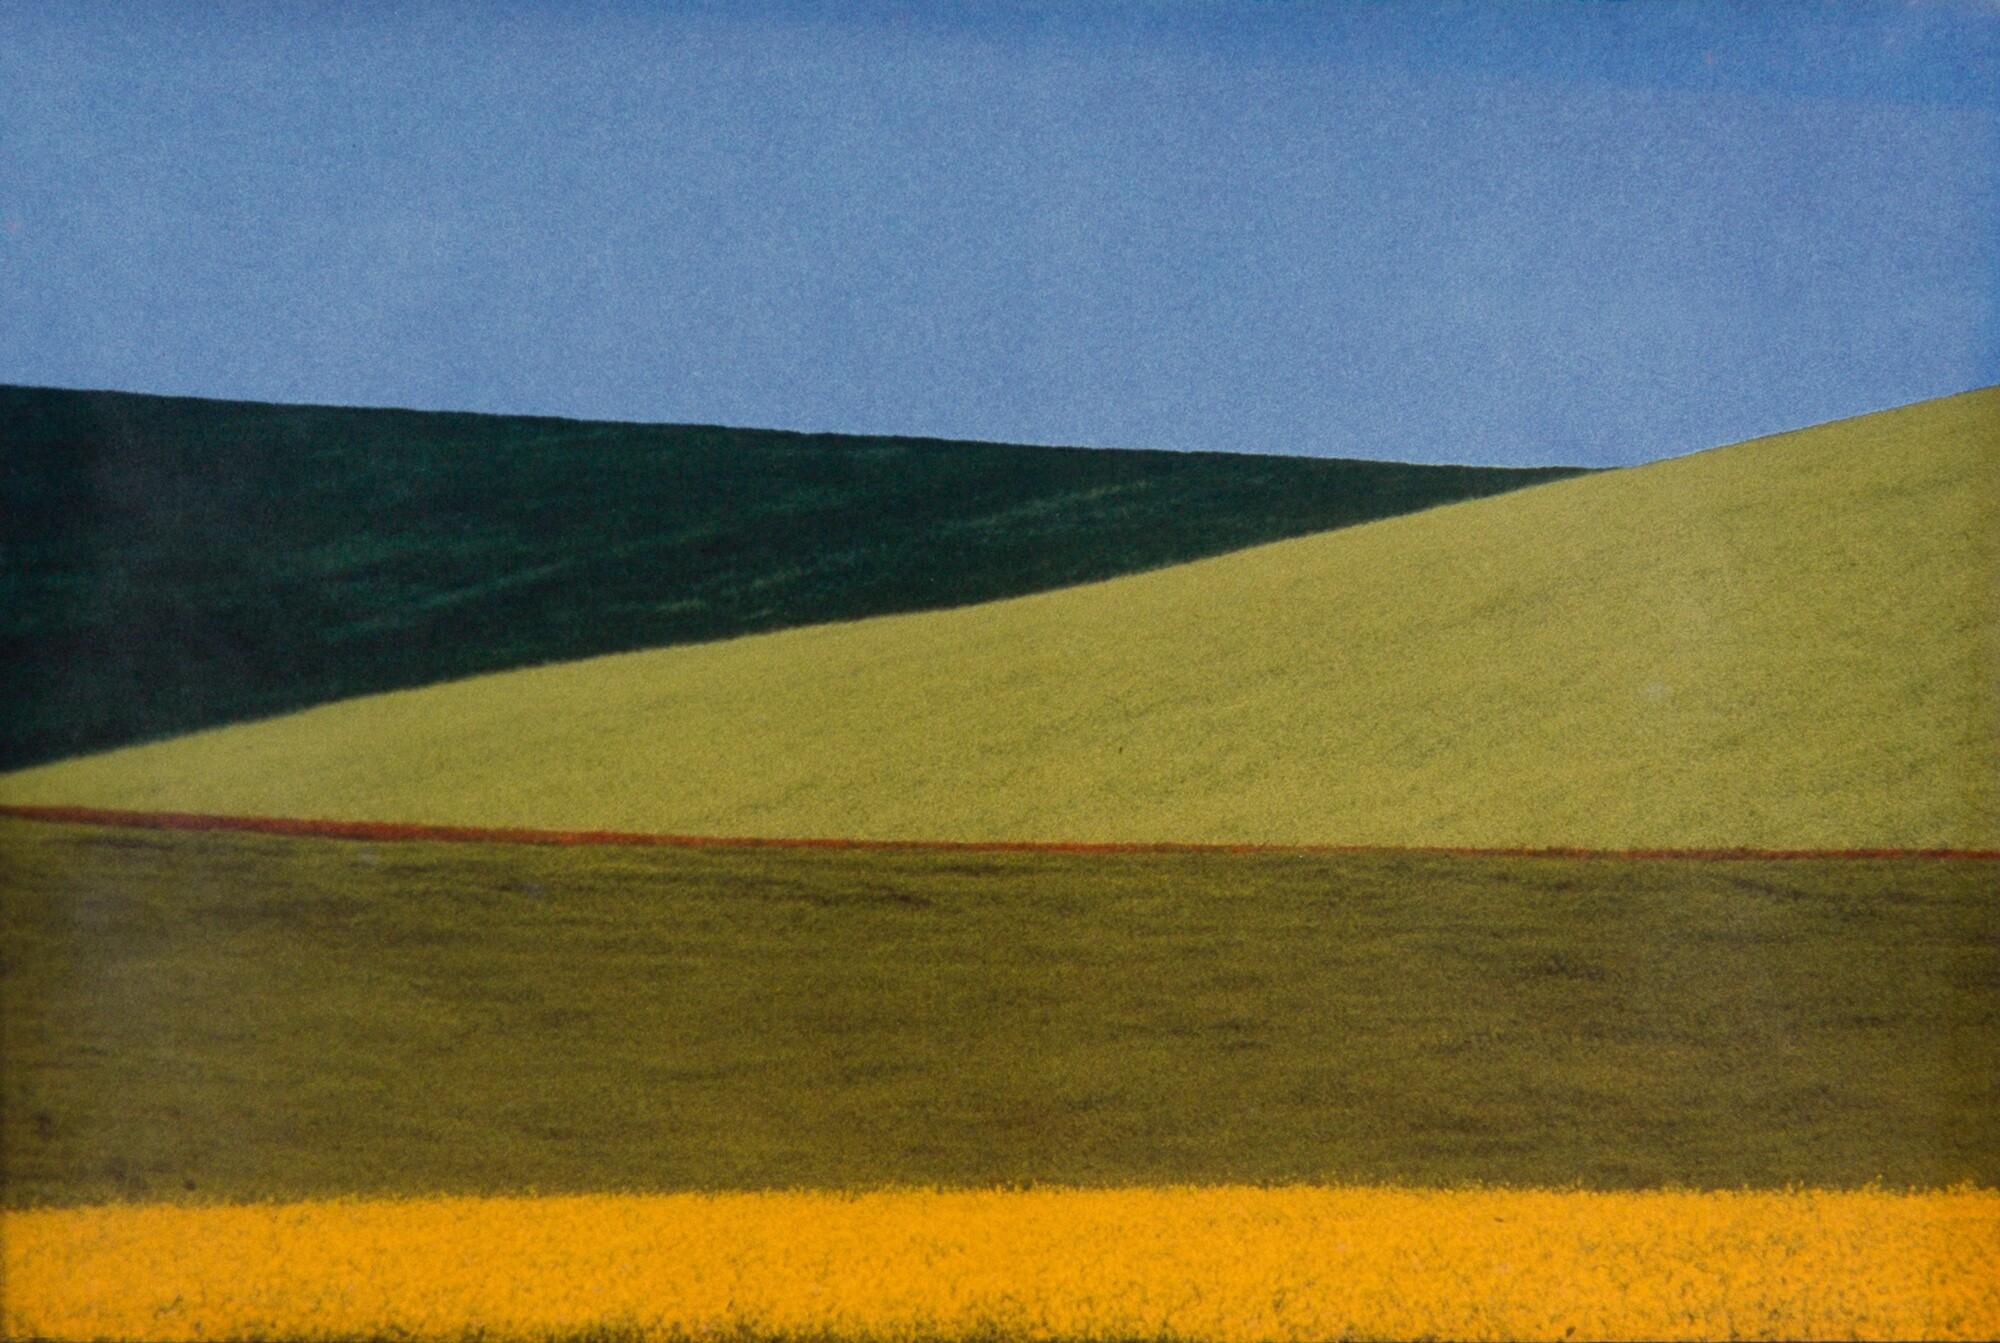 Пейзаж, 1978. Фотограф Франко Фонтана